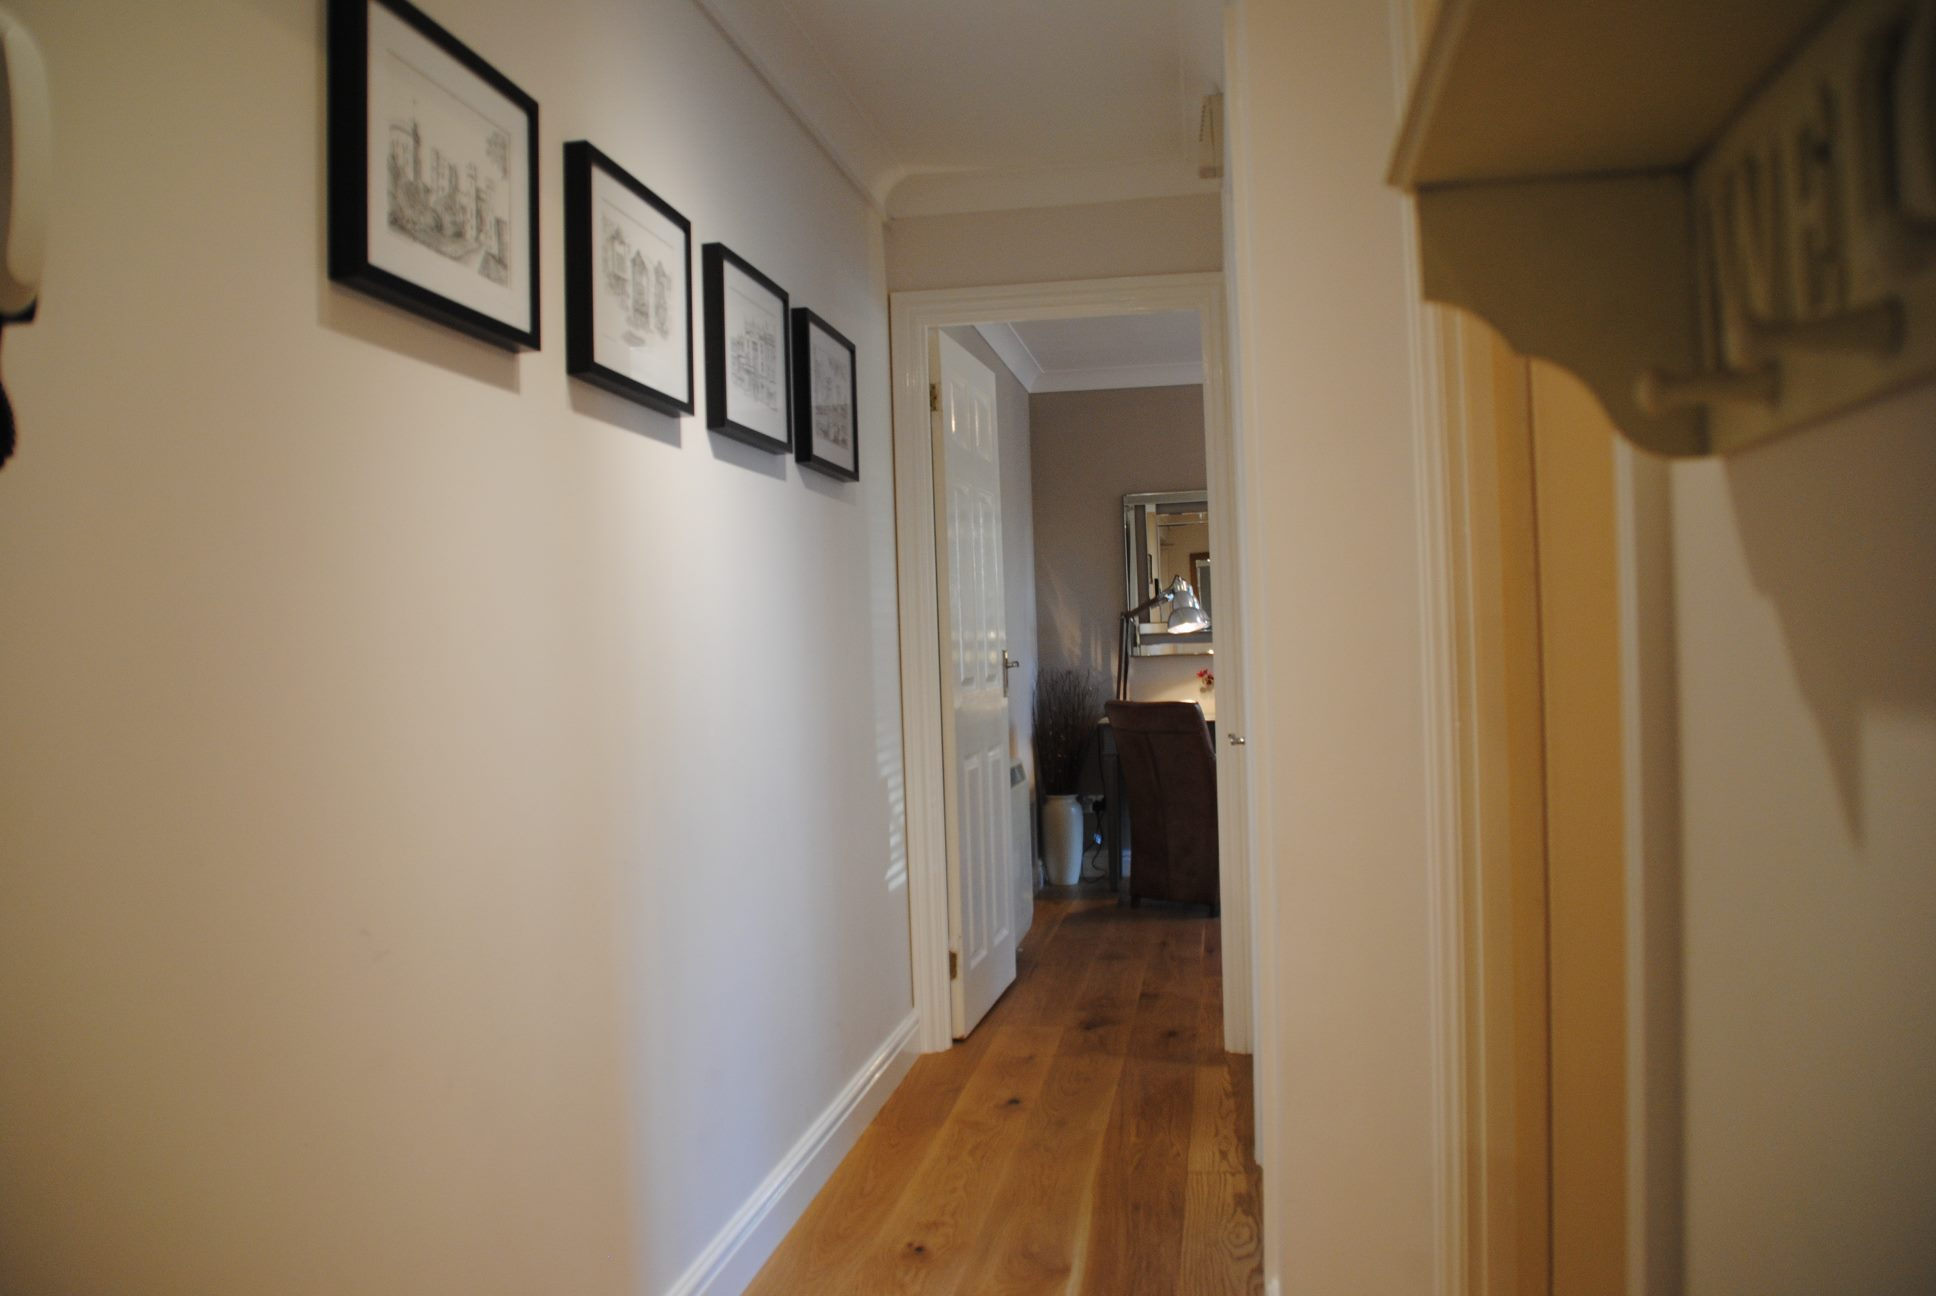 Hallway at Elizabeth Court Apartments